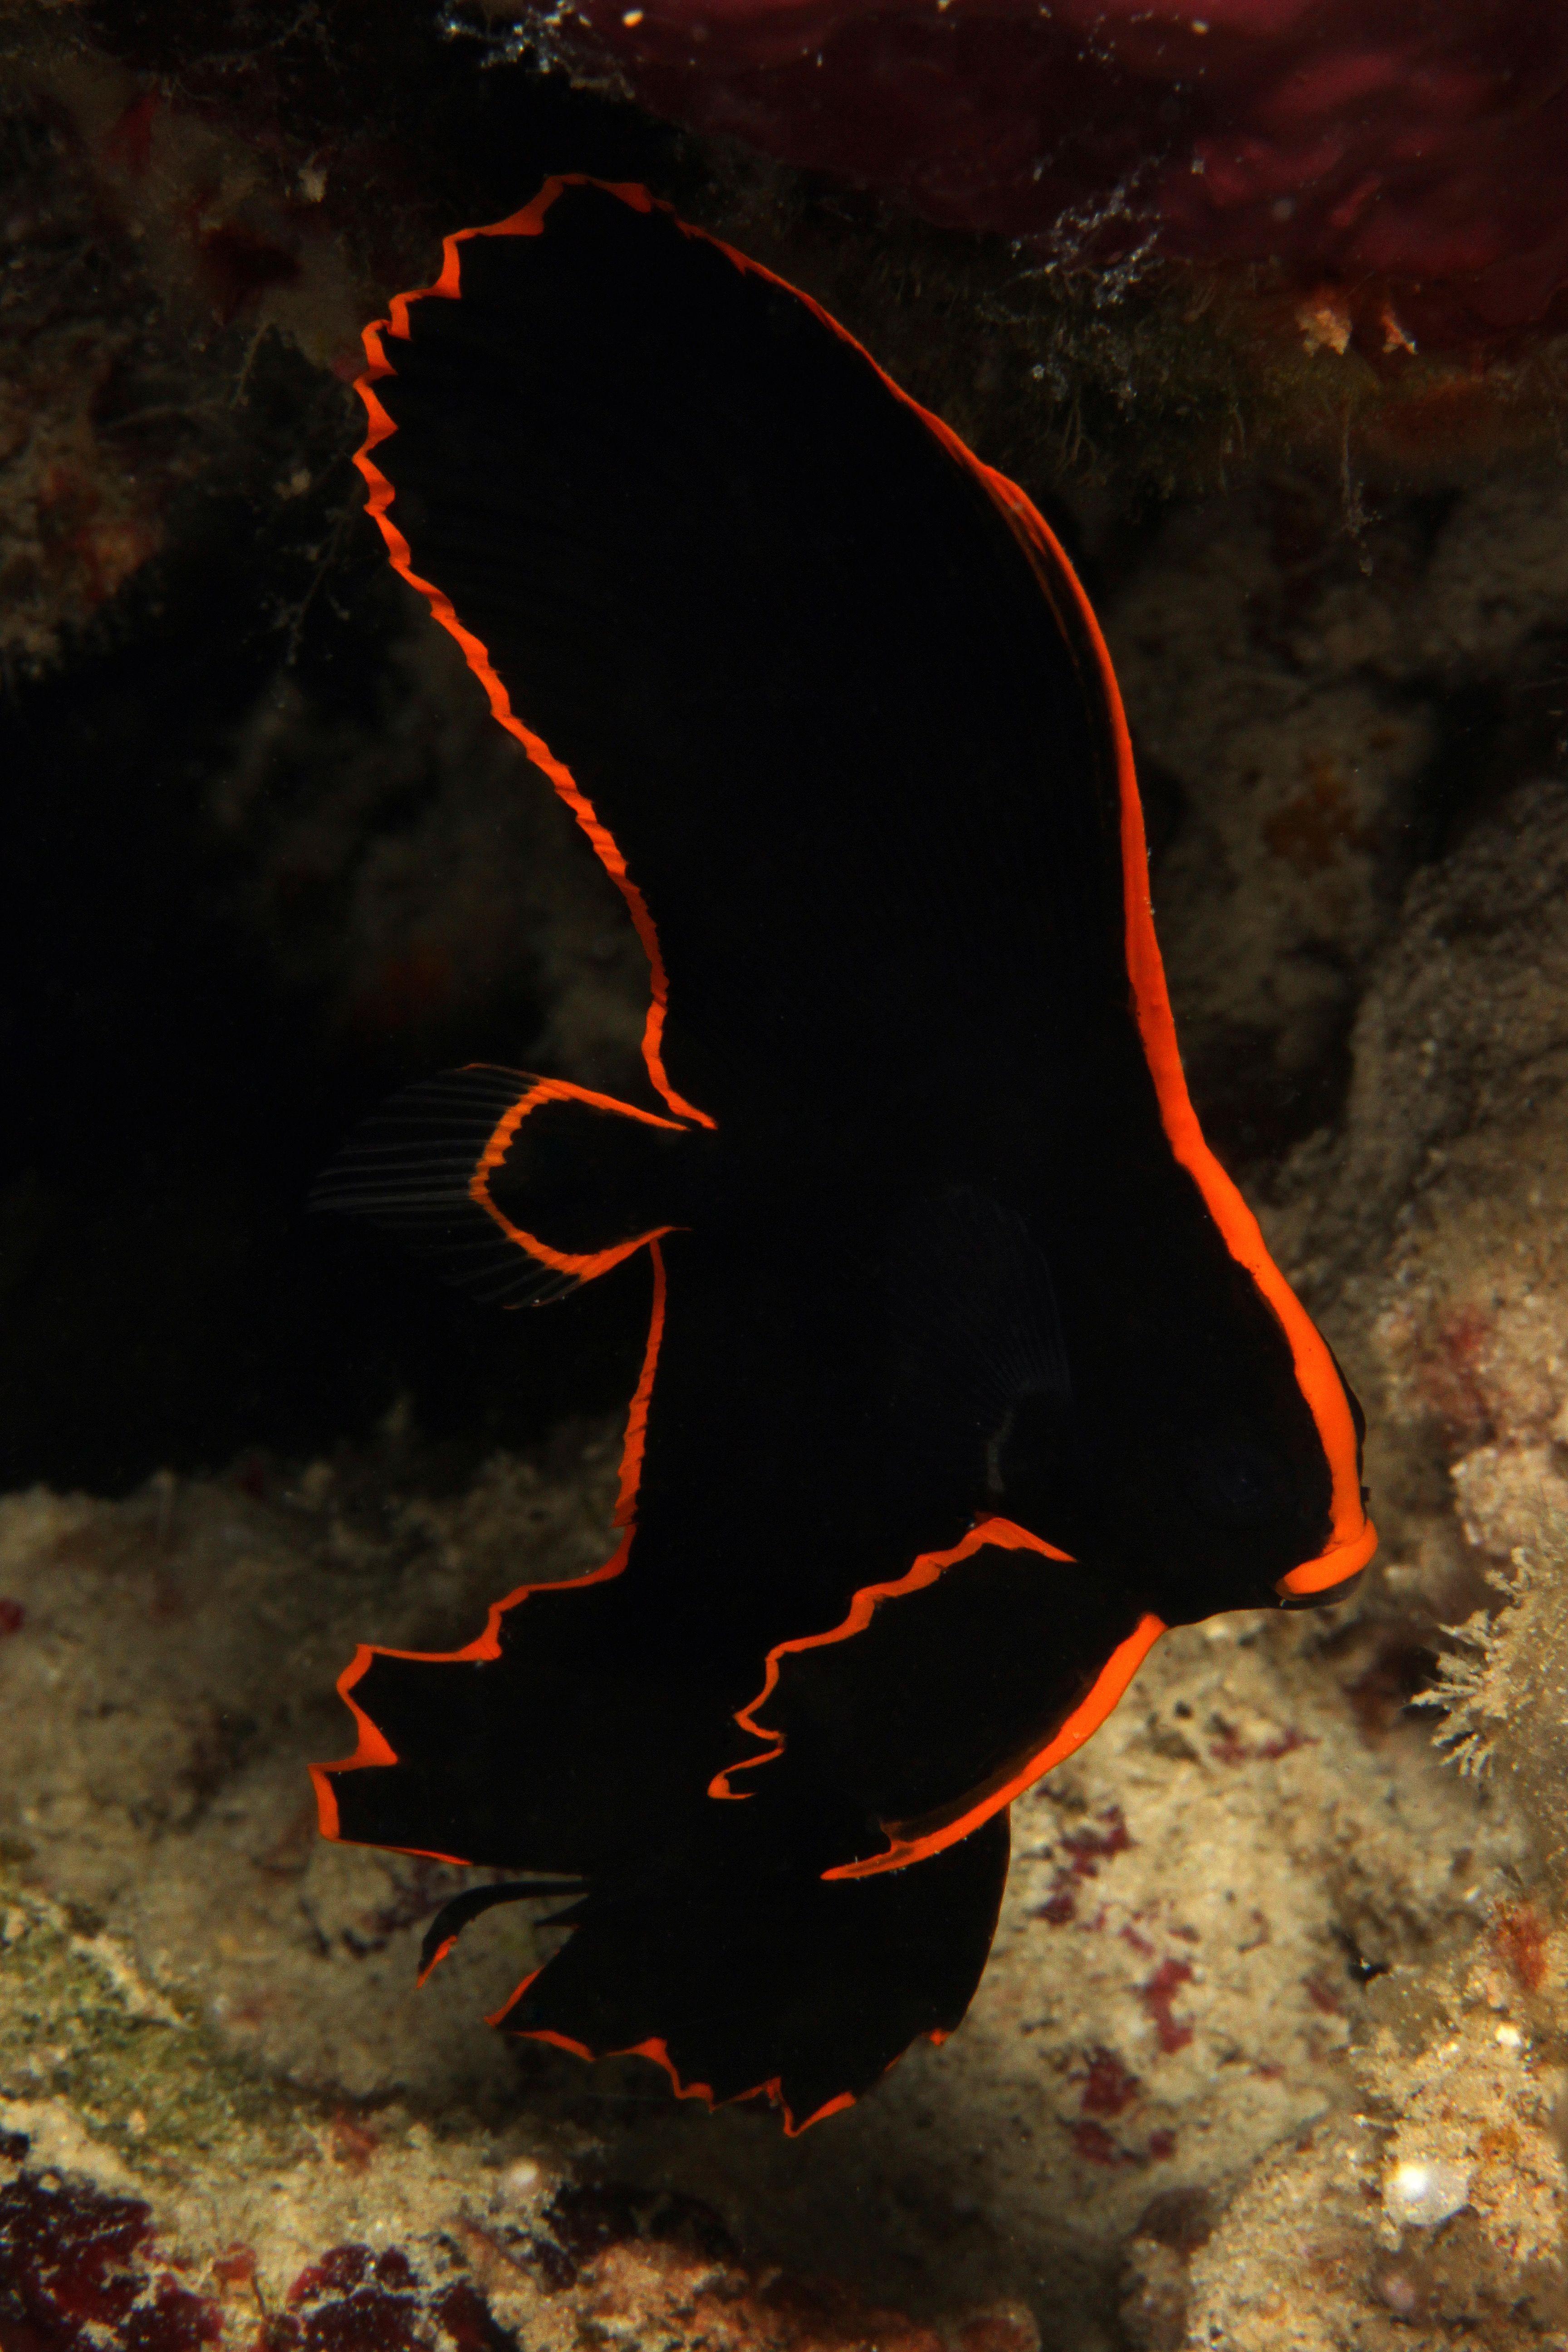 Juvenile Pinnatus Batfish Batfish Creatures Life Images